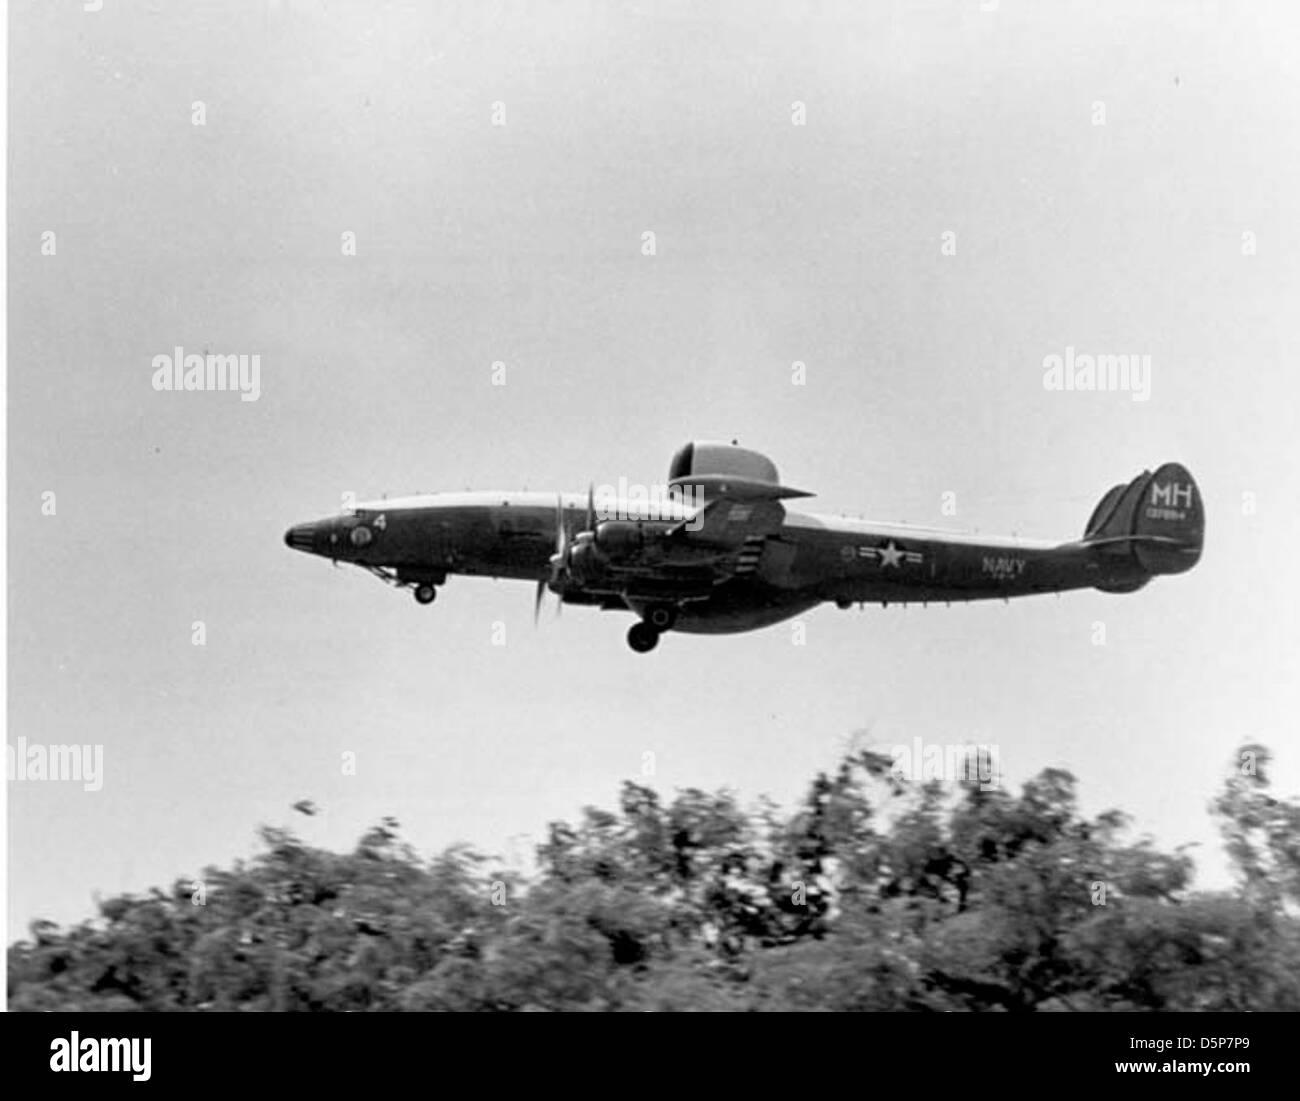 VW-4 MH-4 TAKEOFF WEB - Stock Image